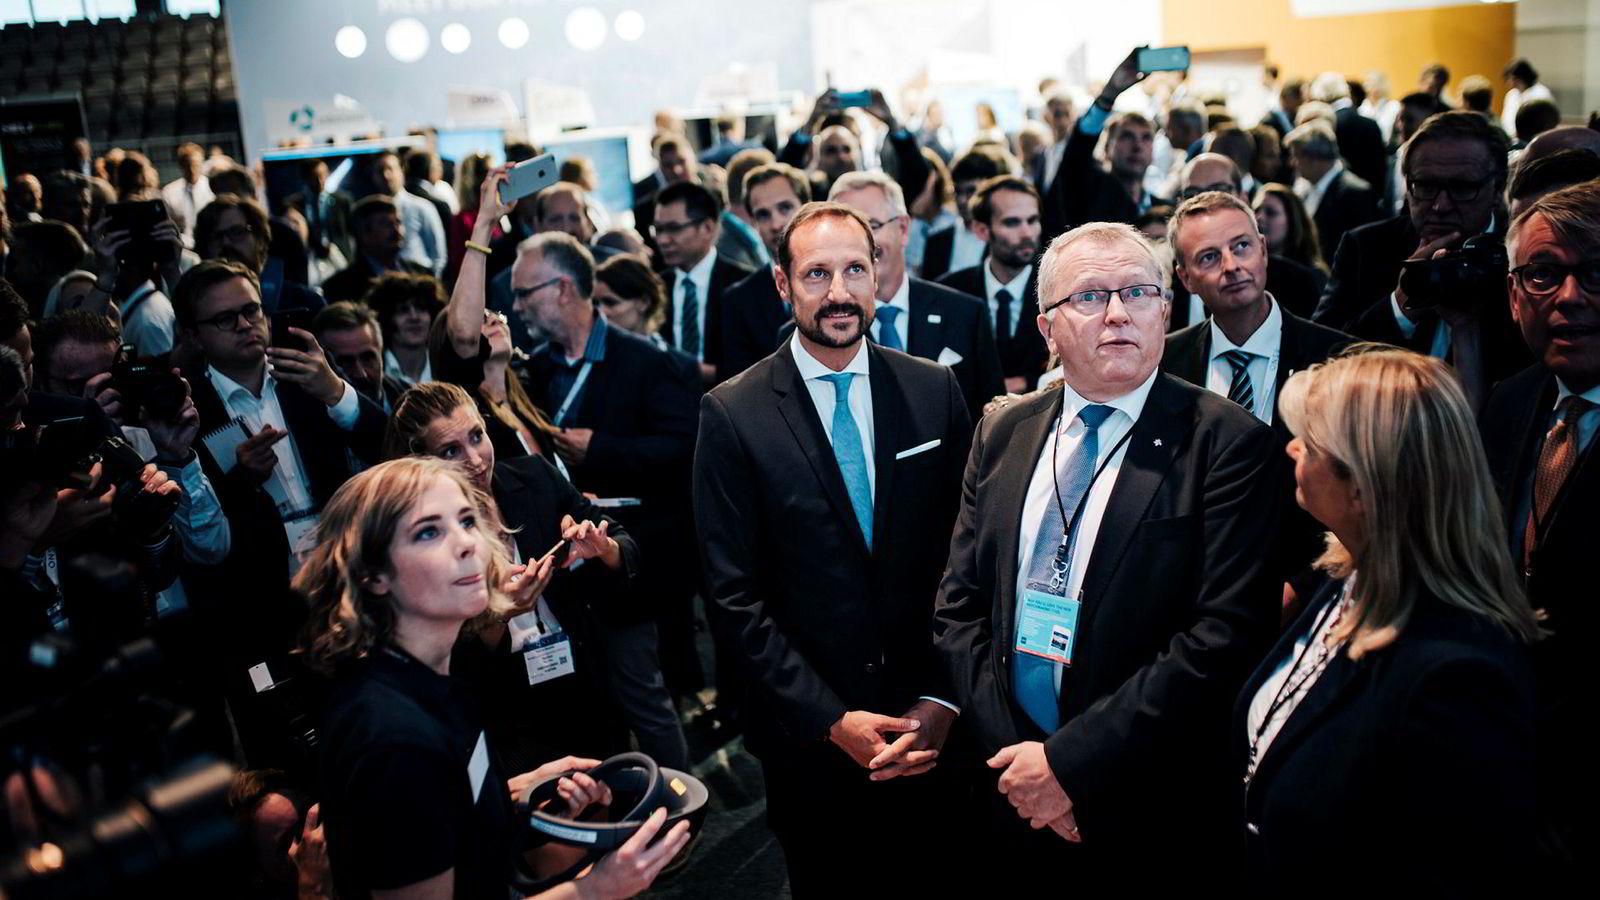 Kronprins Haakon besøkte Equinors stand og konsernsjef Eldar Sætre under oljemessen i Stavanger mandag.